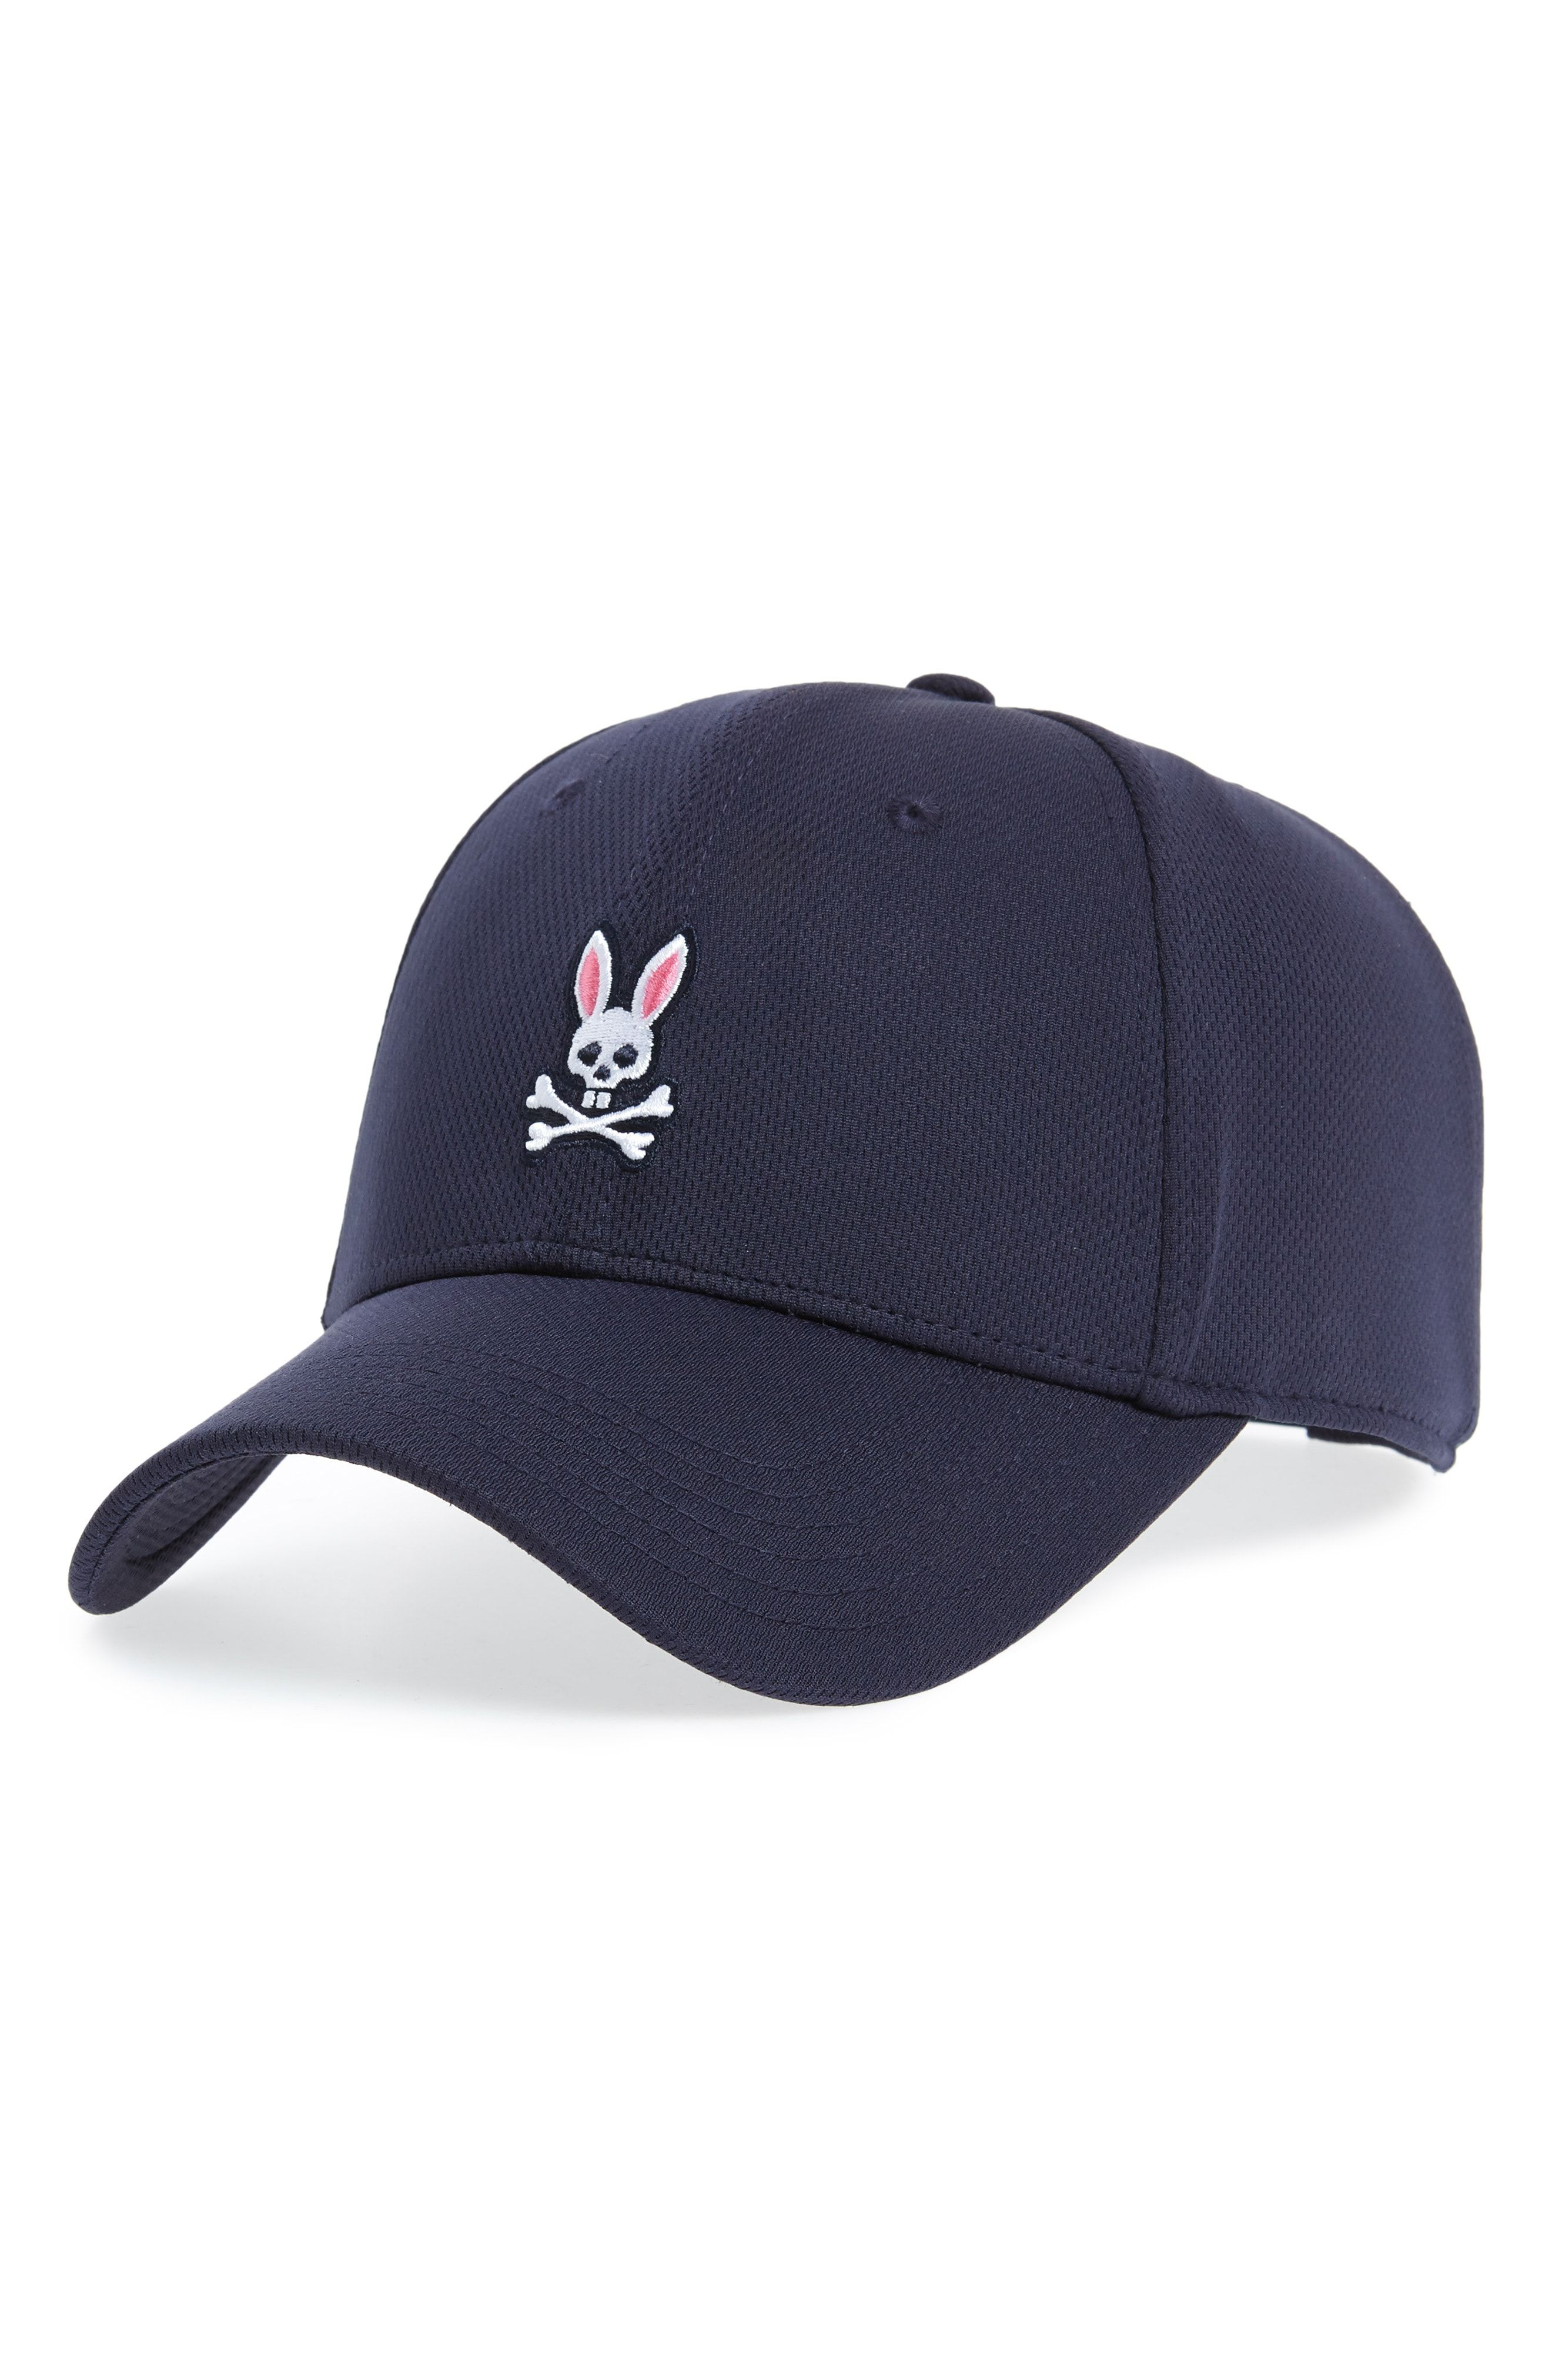 201ef7599c9 PSYCHO BUNNY SPORT BALL CAP - BLUE. #psychobunny | Psycho Bunny in ...